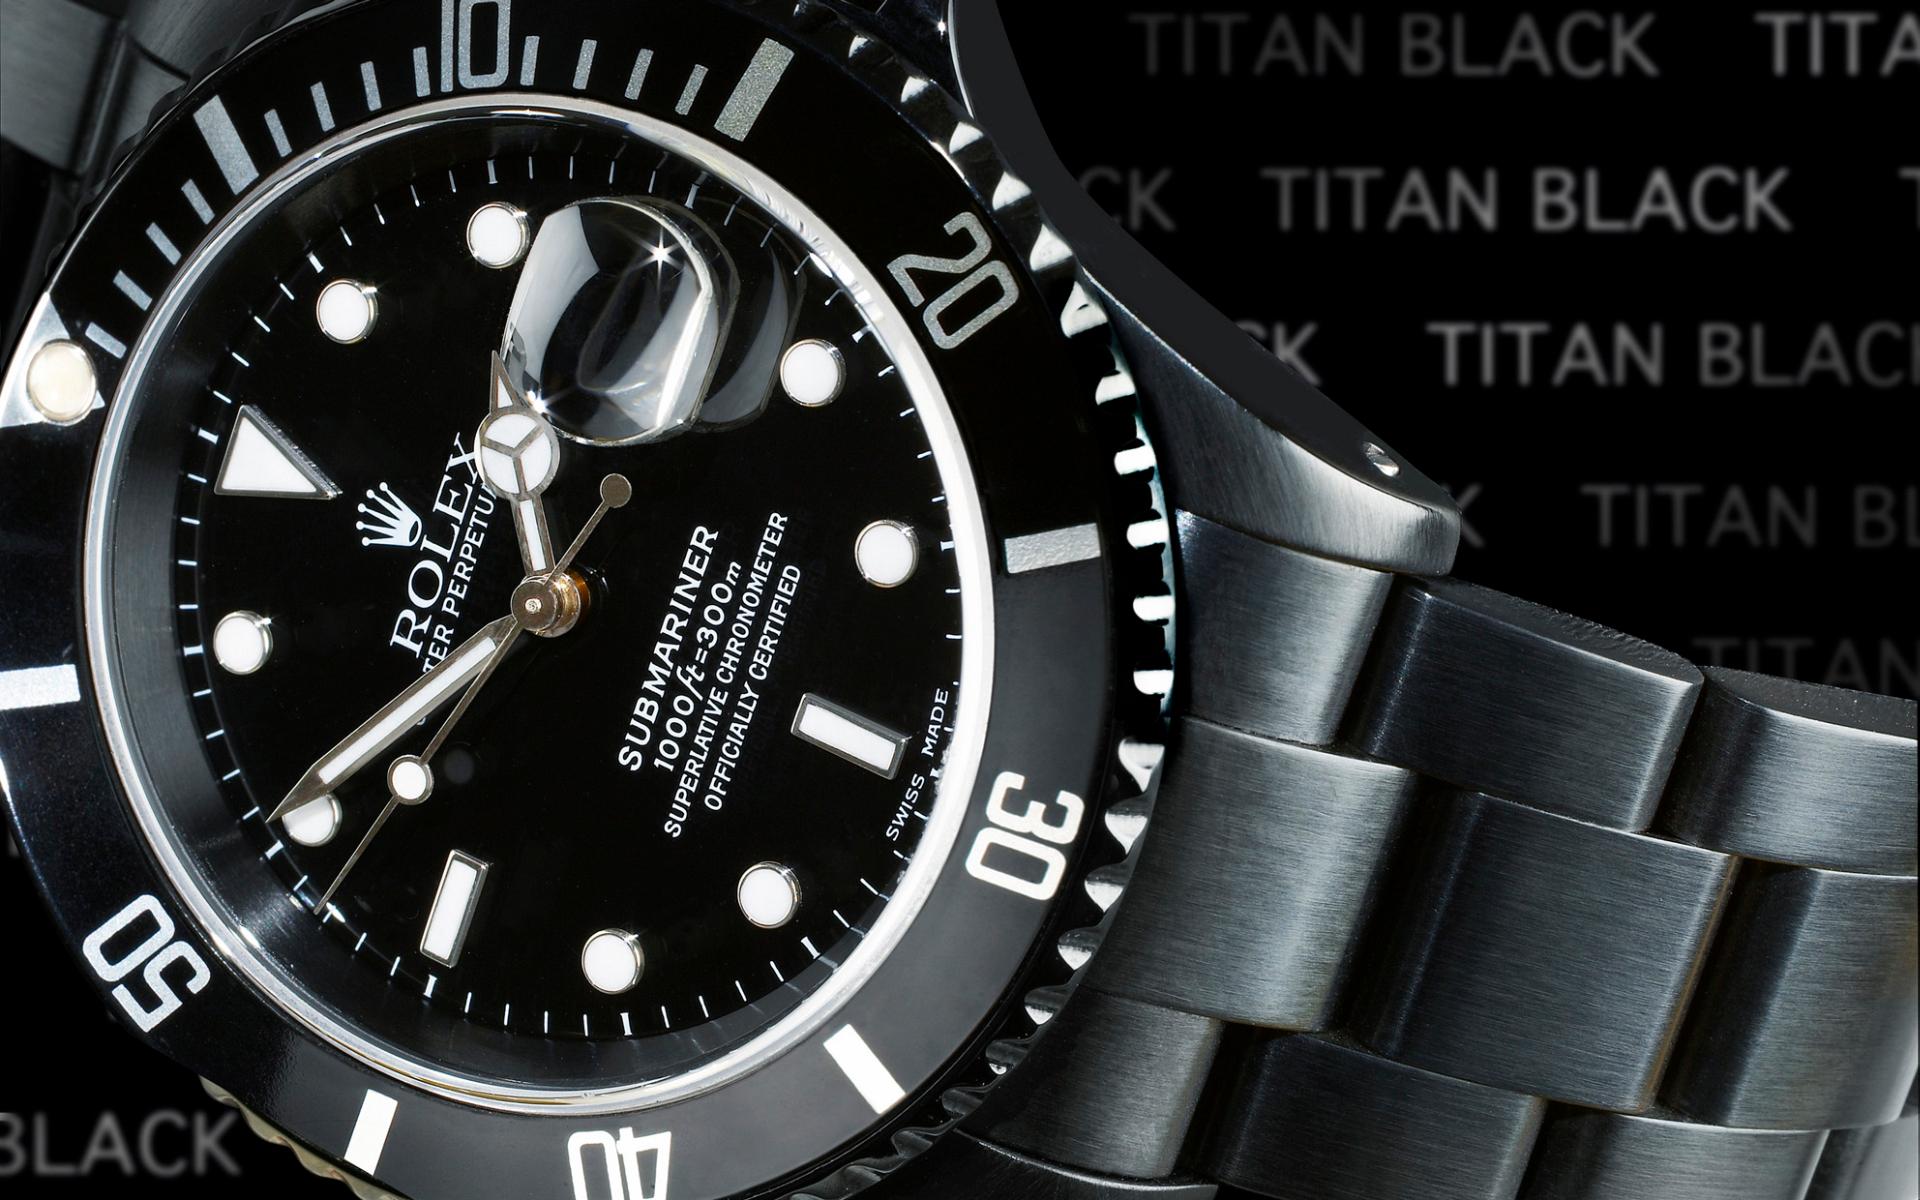 titanblack rolex submariner dlc watch computer wallpapers